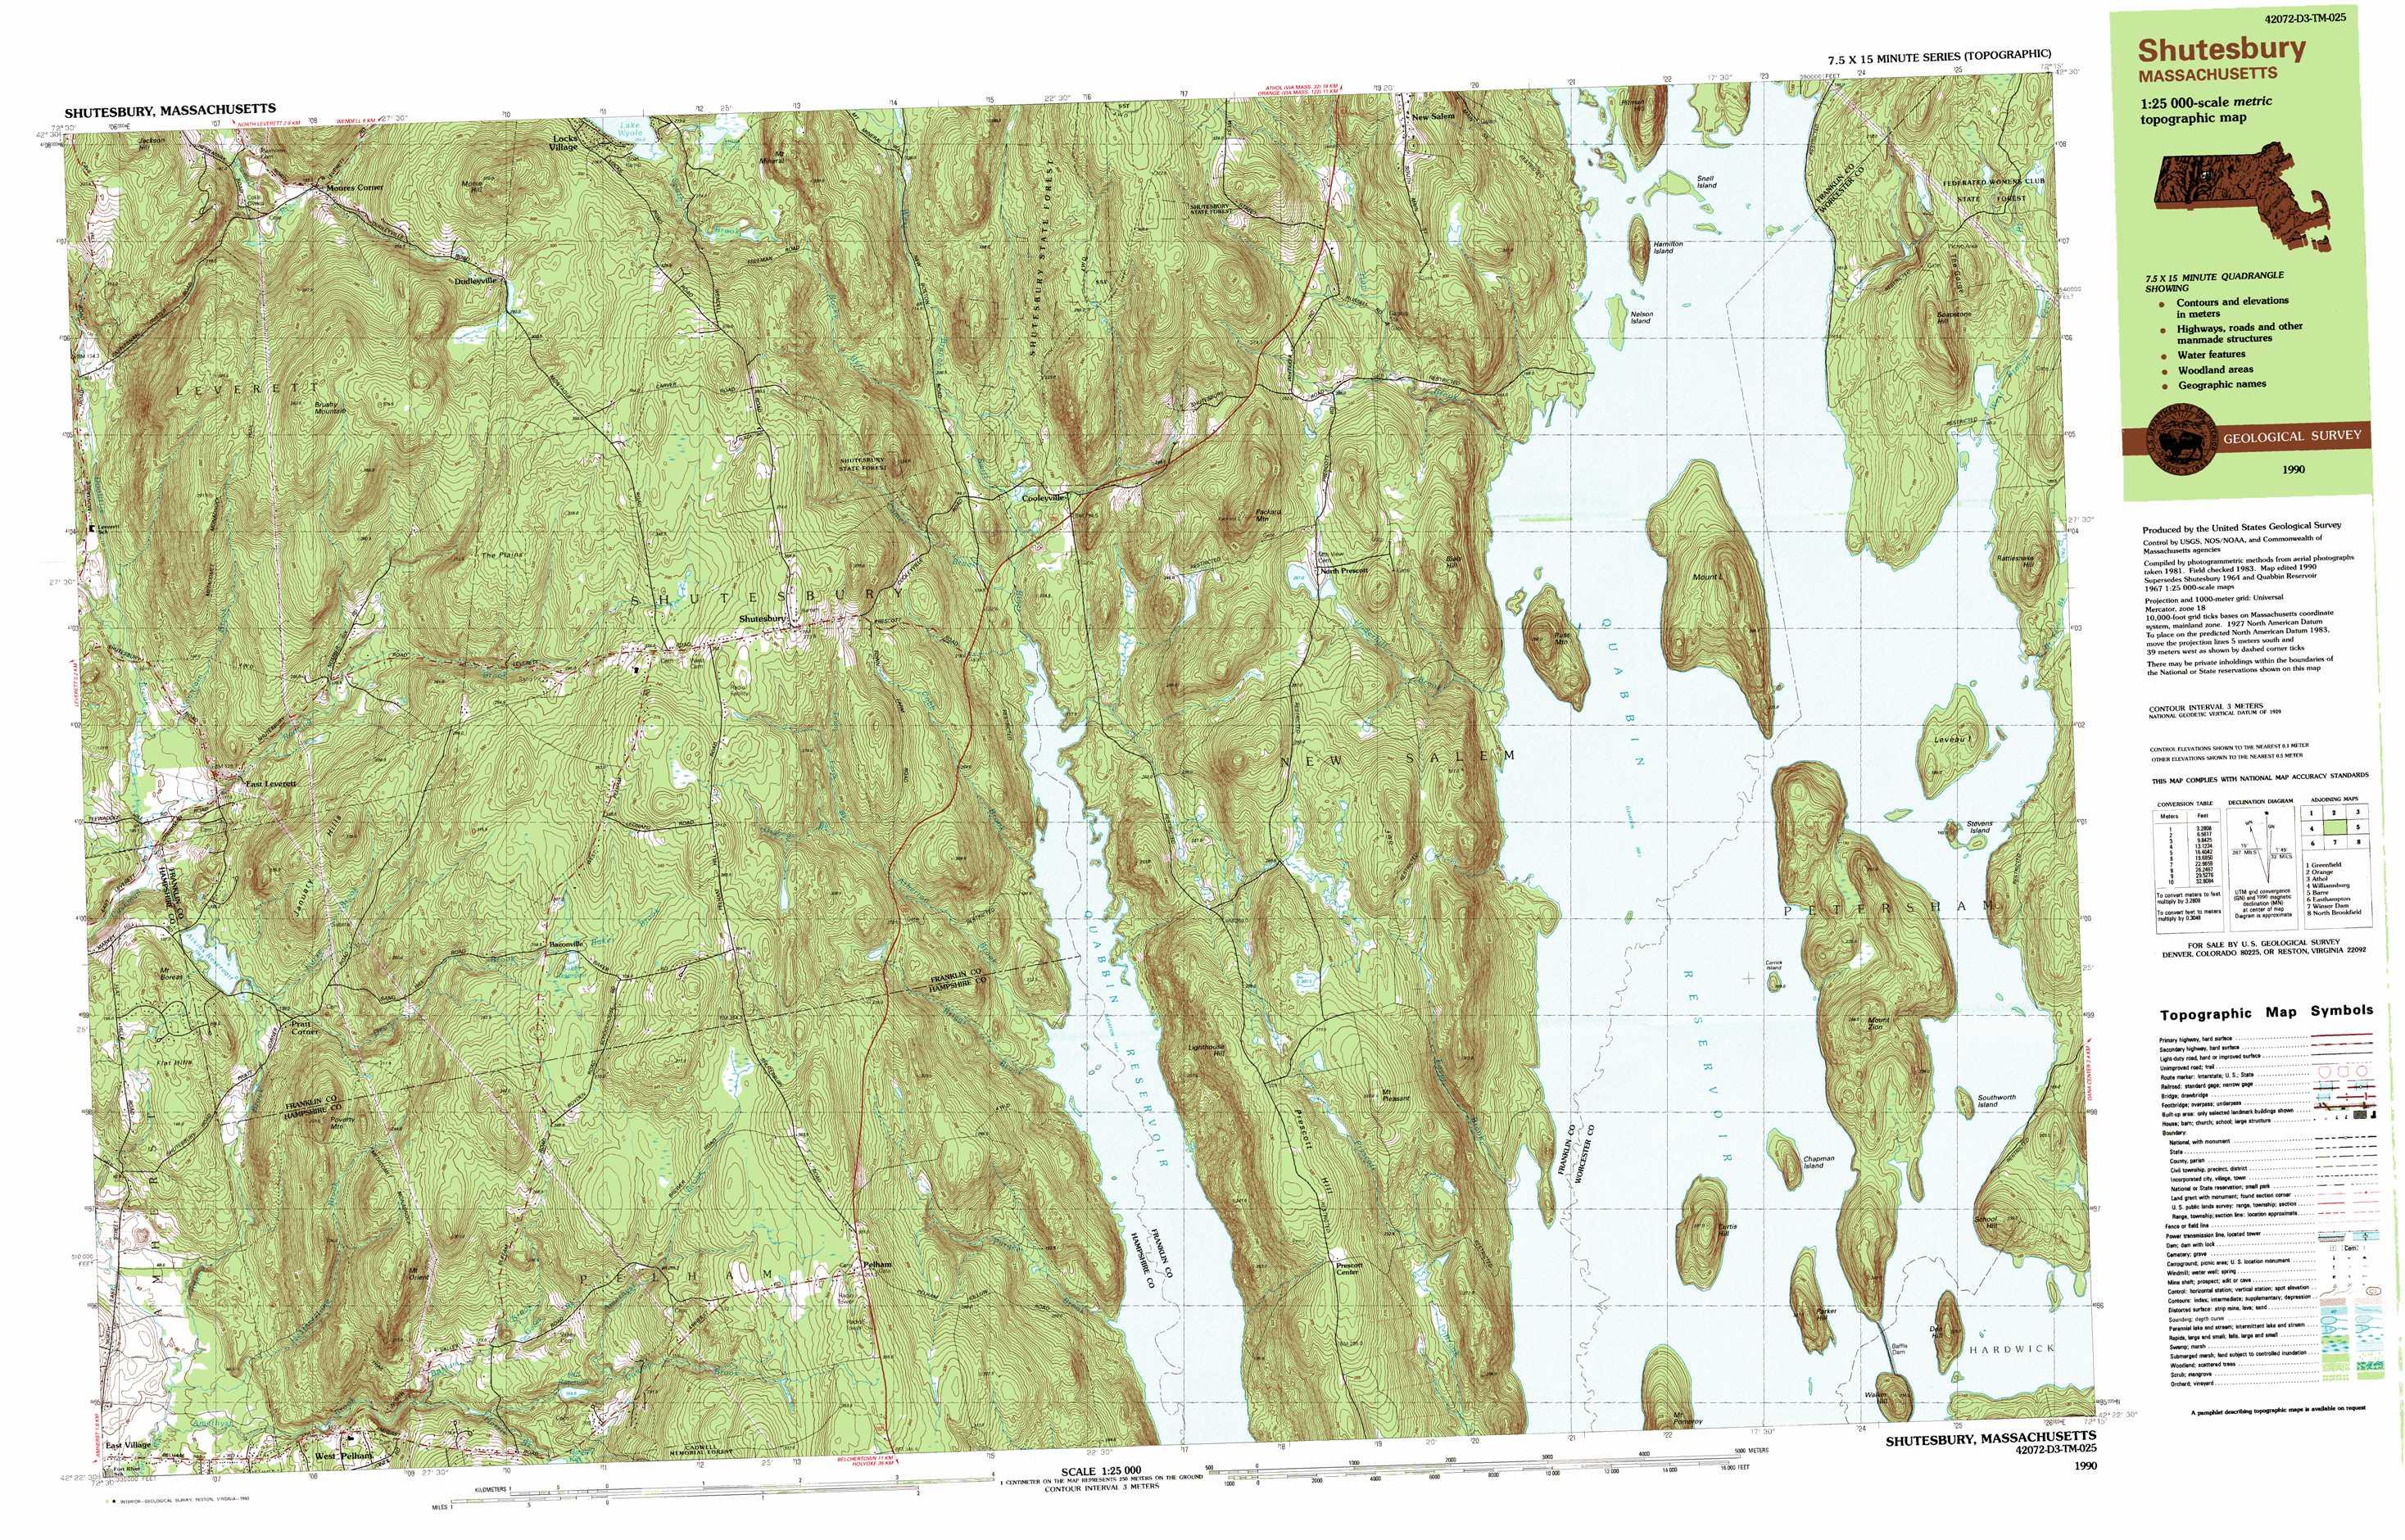 Quabbin Reservoir topographic map, MA - USGS Topo Quad 42072d3 on